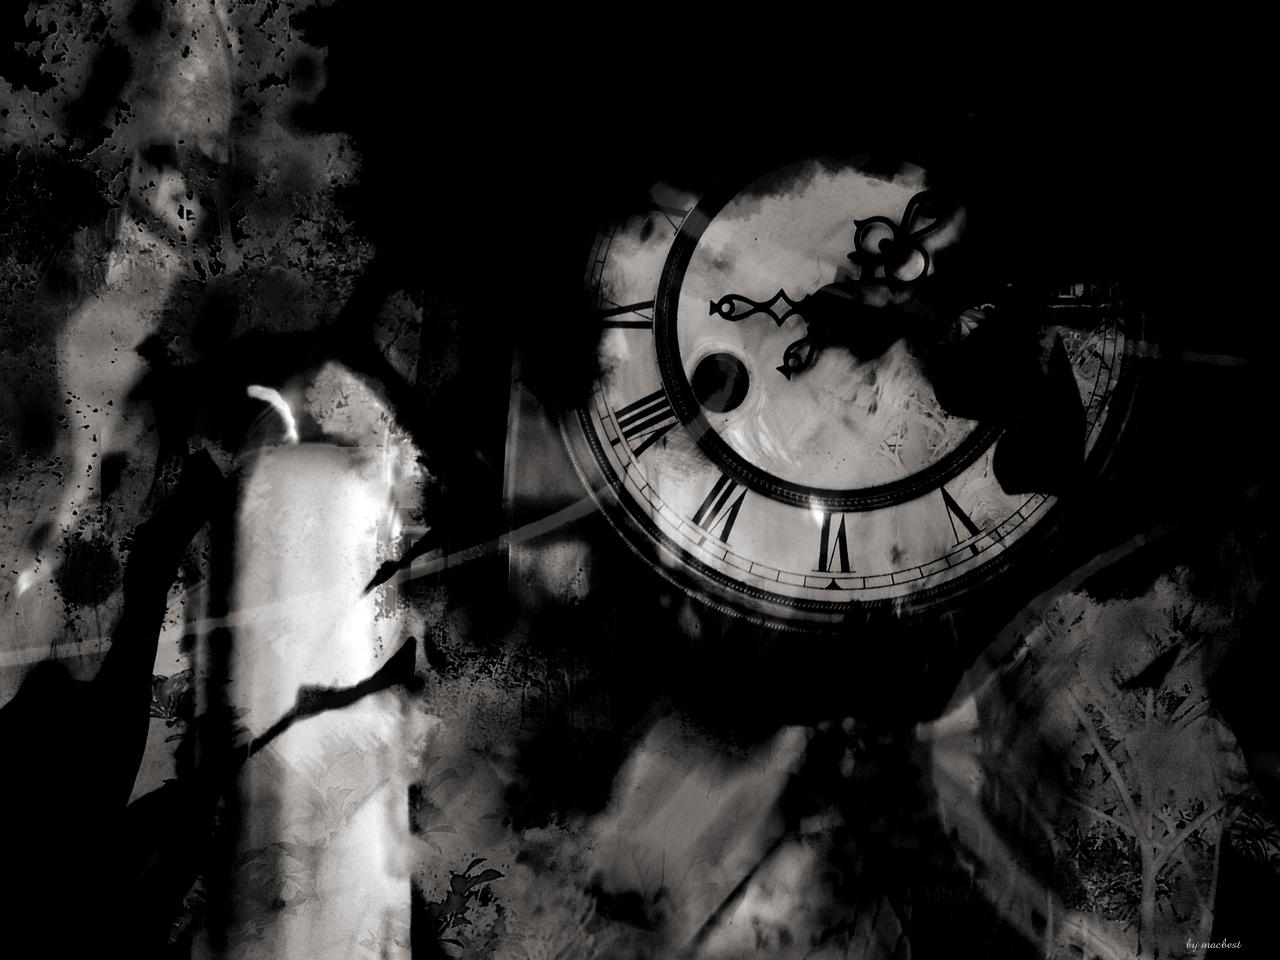 http://2.bp.blogspot.com/-_QLLuU5UDM8/Te9SozovxkI/AAAAAAAAAG4/1jI8AWUh7Qw/s1600/sad-time-clock-night.jpg